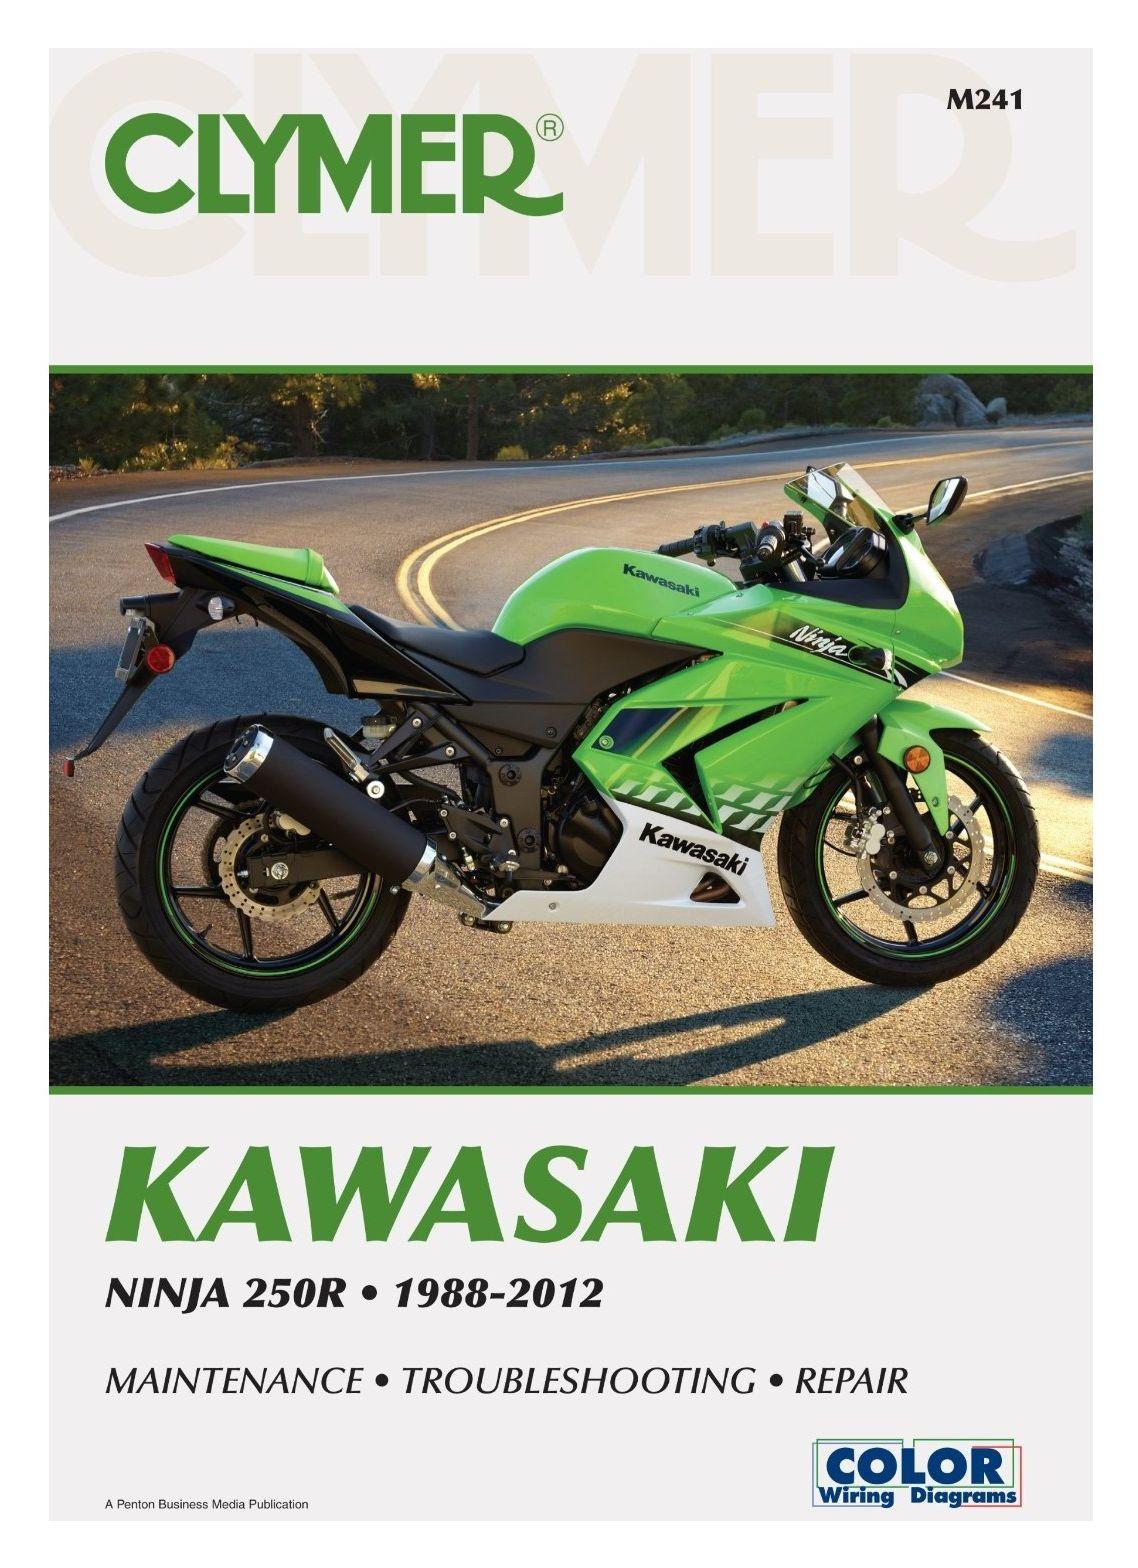 clymer manual kawasaki ninja 250r 1988 2012 cycle gear rh cyclegear com clymer harley manual review clymer service manual review